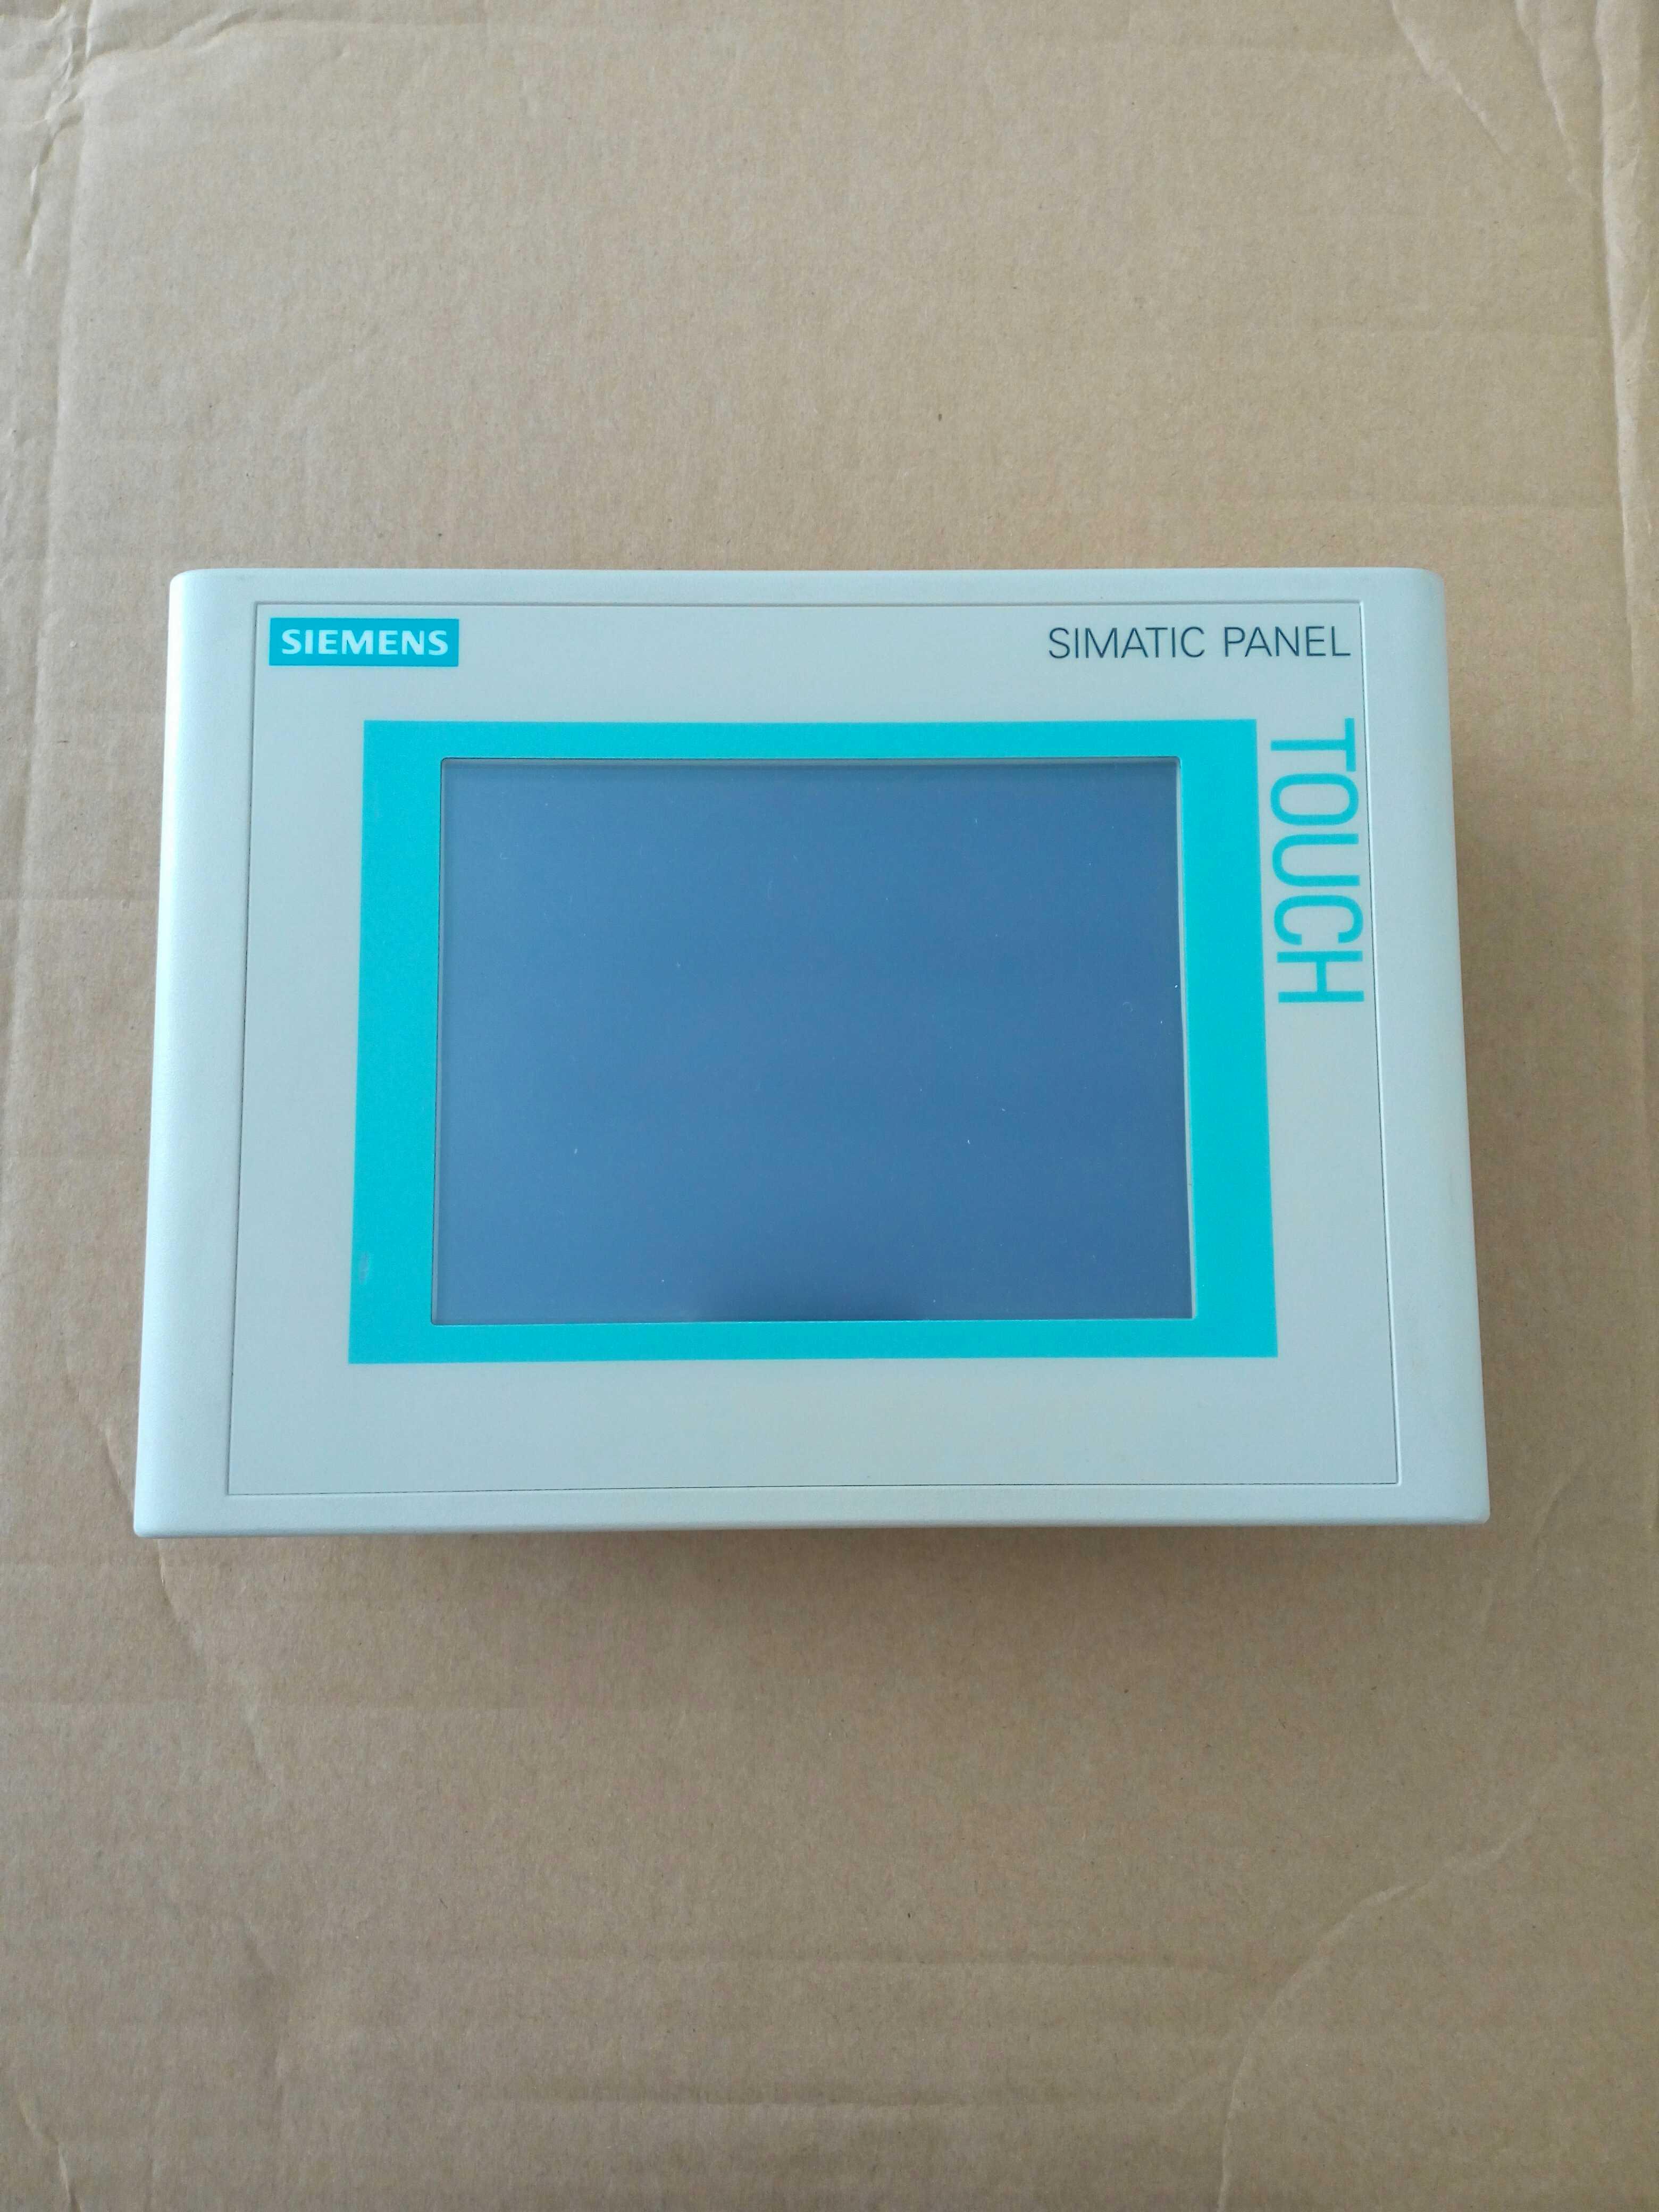 TP 177micro New SIEMENS TP177 6AV6640-0CA11-0AX1 touch screen //glass film